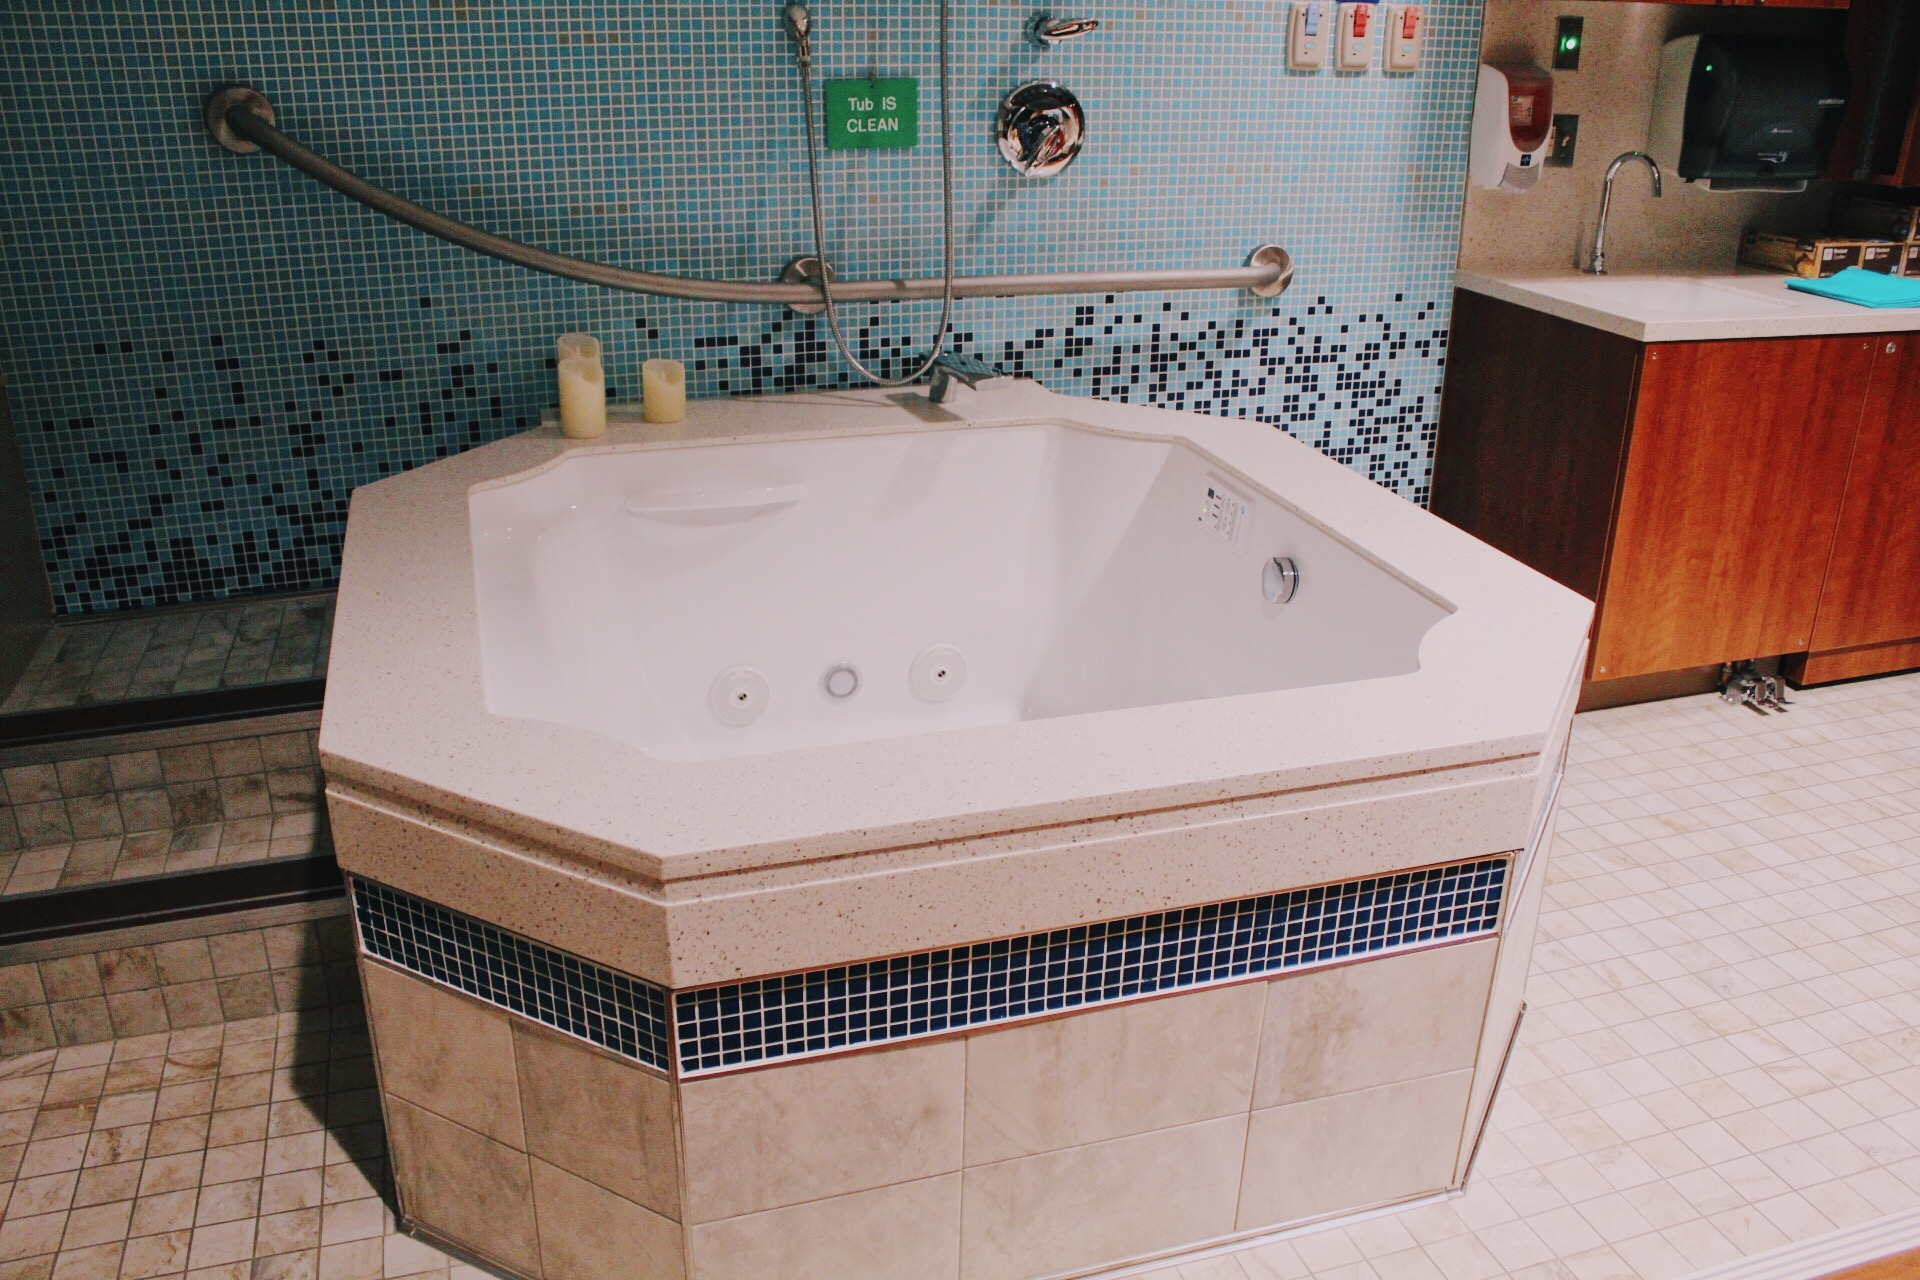 The Birthing Tub